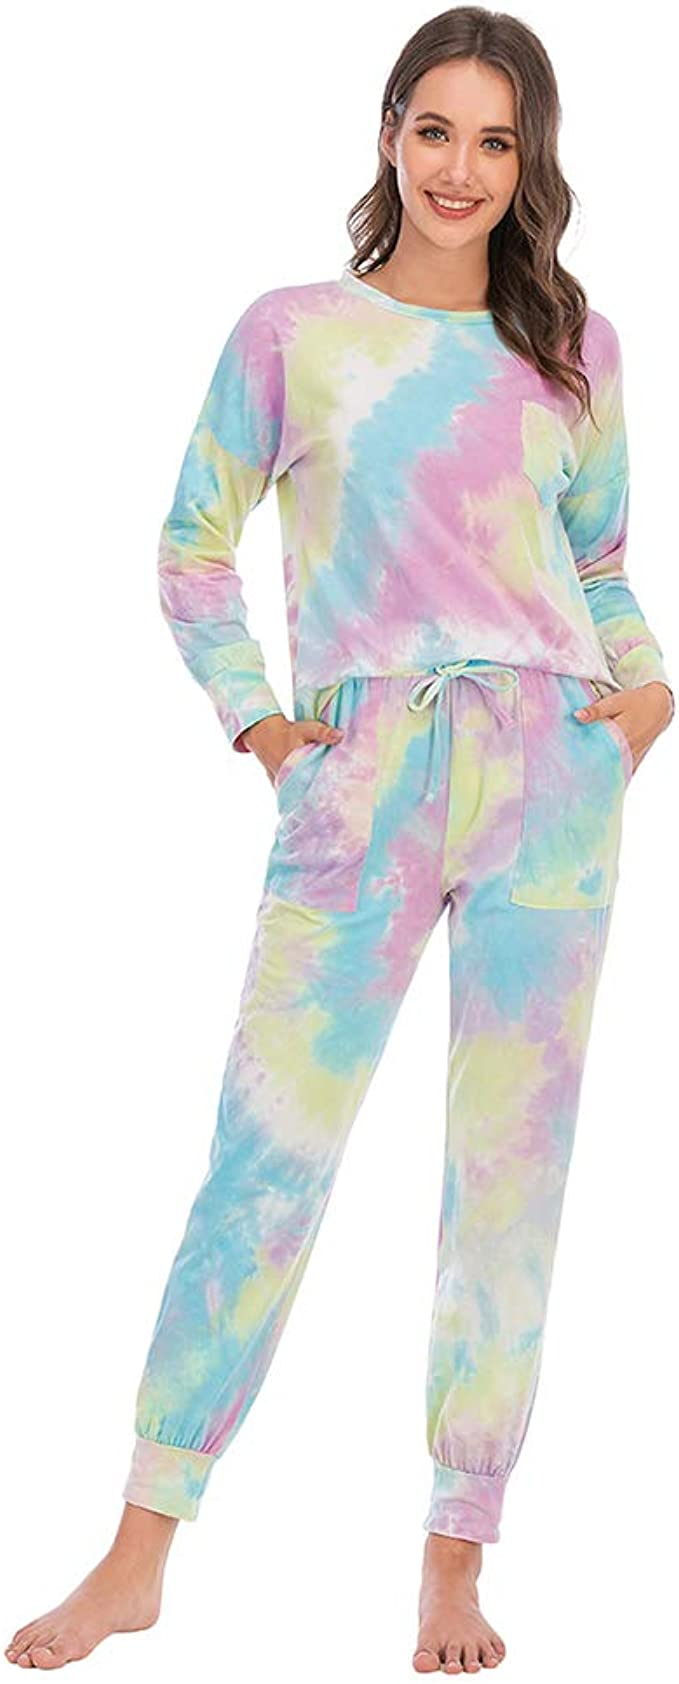 Womens Pajamas Set Long Sleeve Loungewear Tie Dye Cotton Sleepwear Soft Pj Lounge Sets Ladies Casual Elastic Waist Nightwear